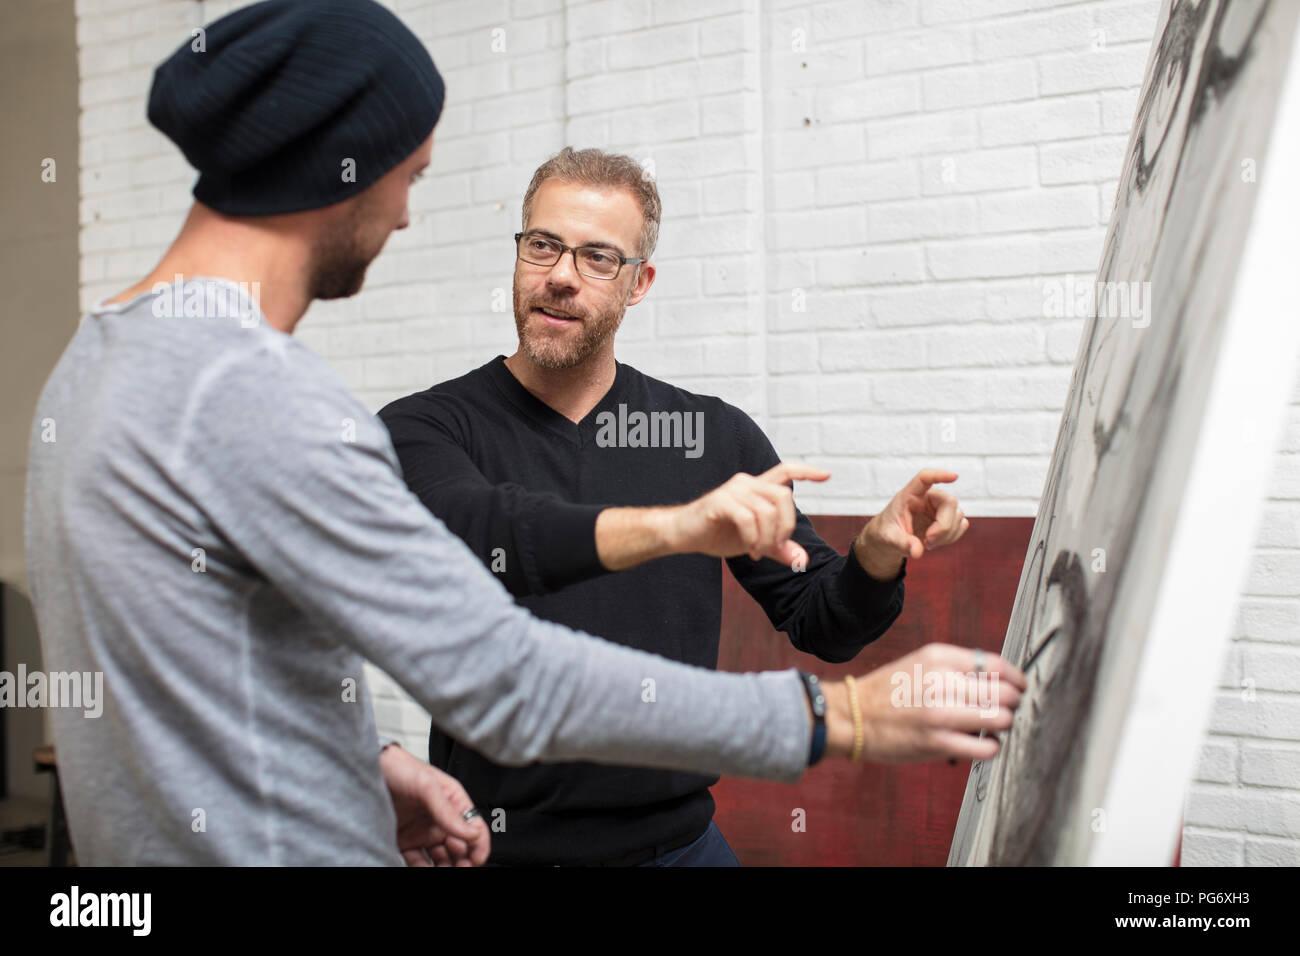 Dessin artiste discuter avec l'homme en studio Photo Stock